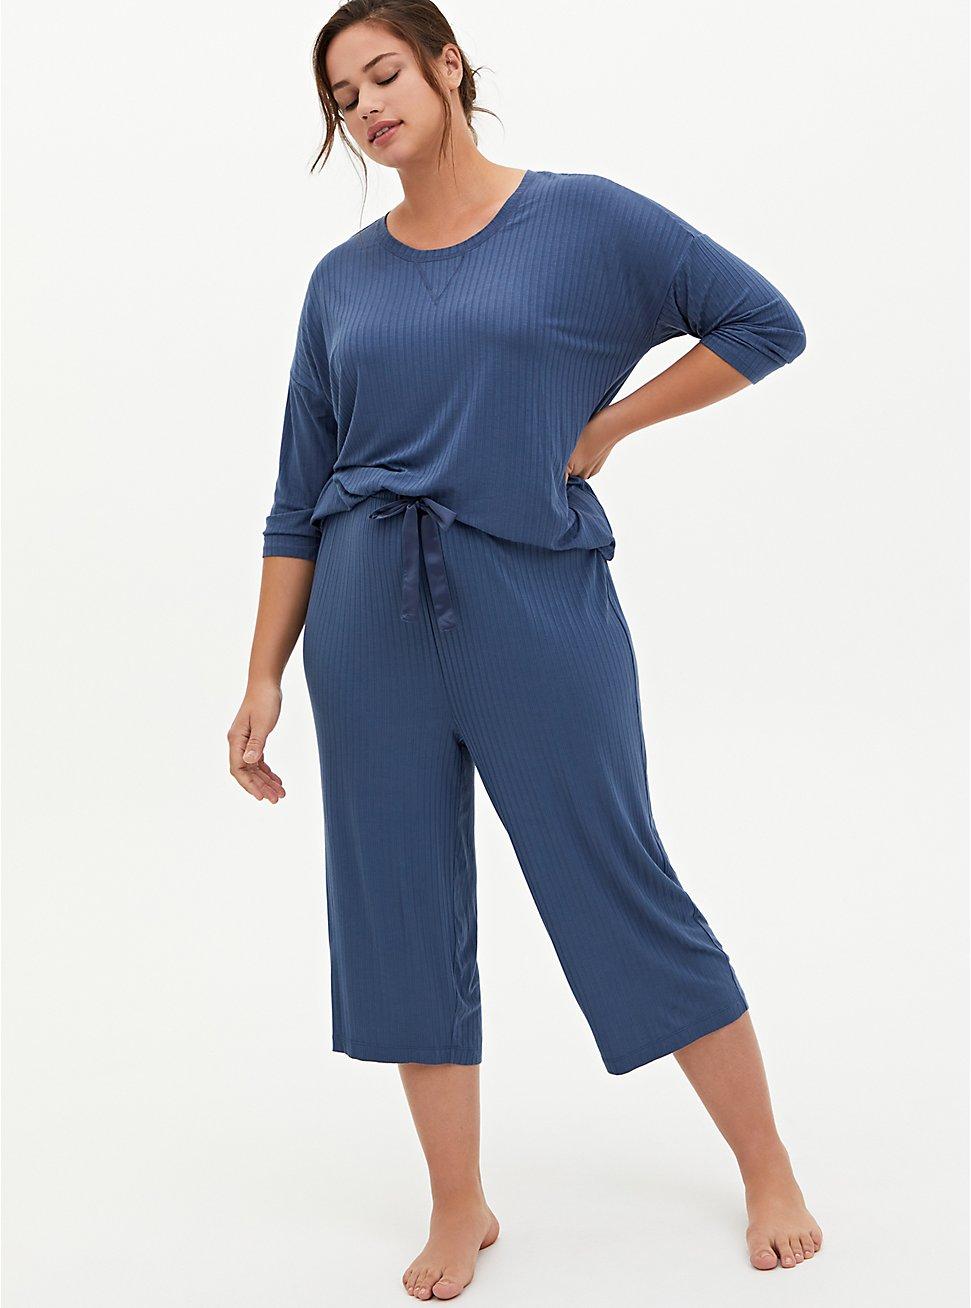 Blue Wide Leg Rib Sleep Pant, BLUE, hi-res